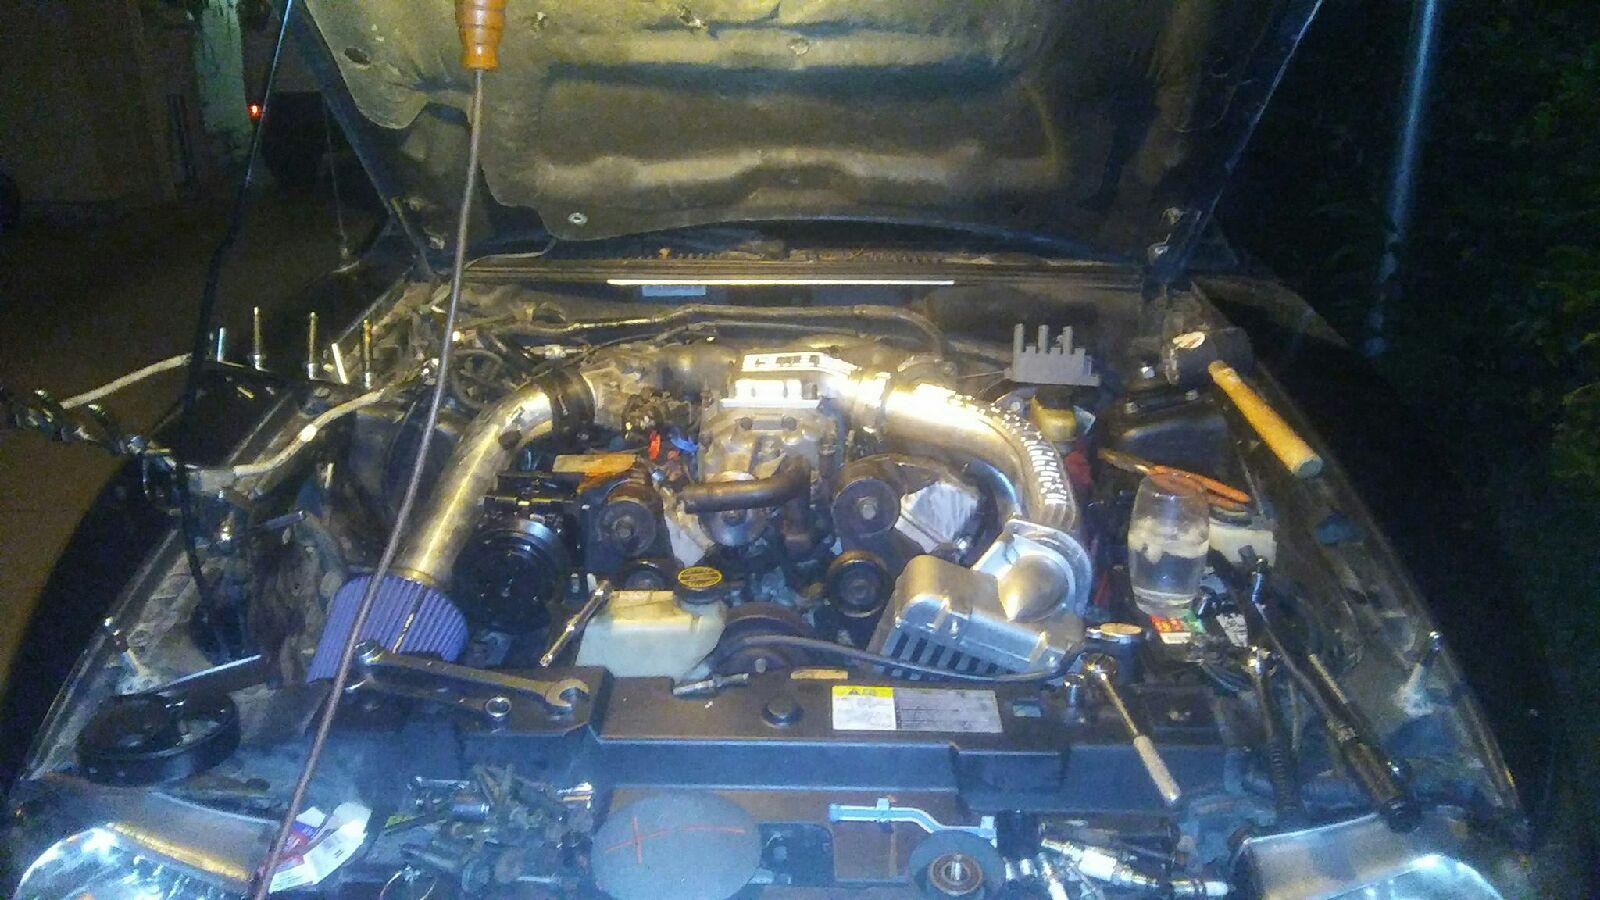 Building a 3 8 l essex v6 that makes 557 whp engine swap depot